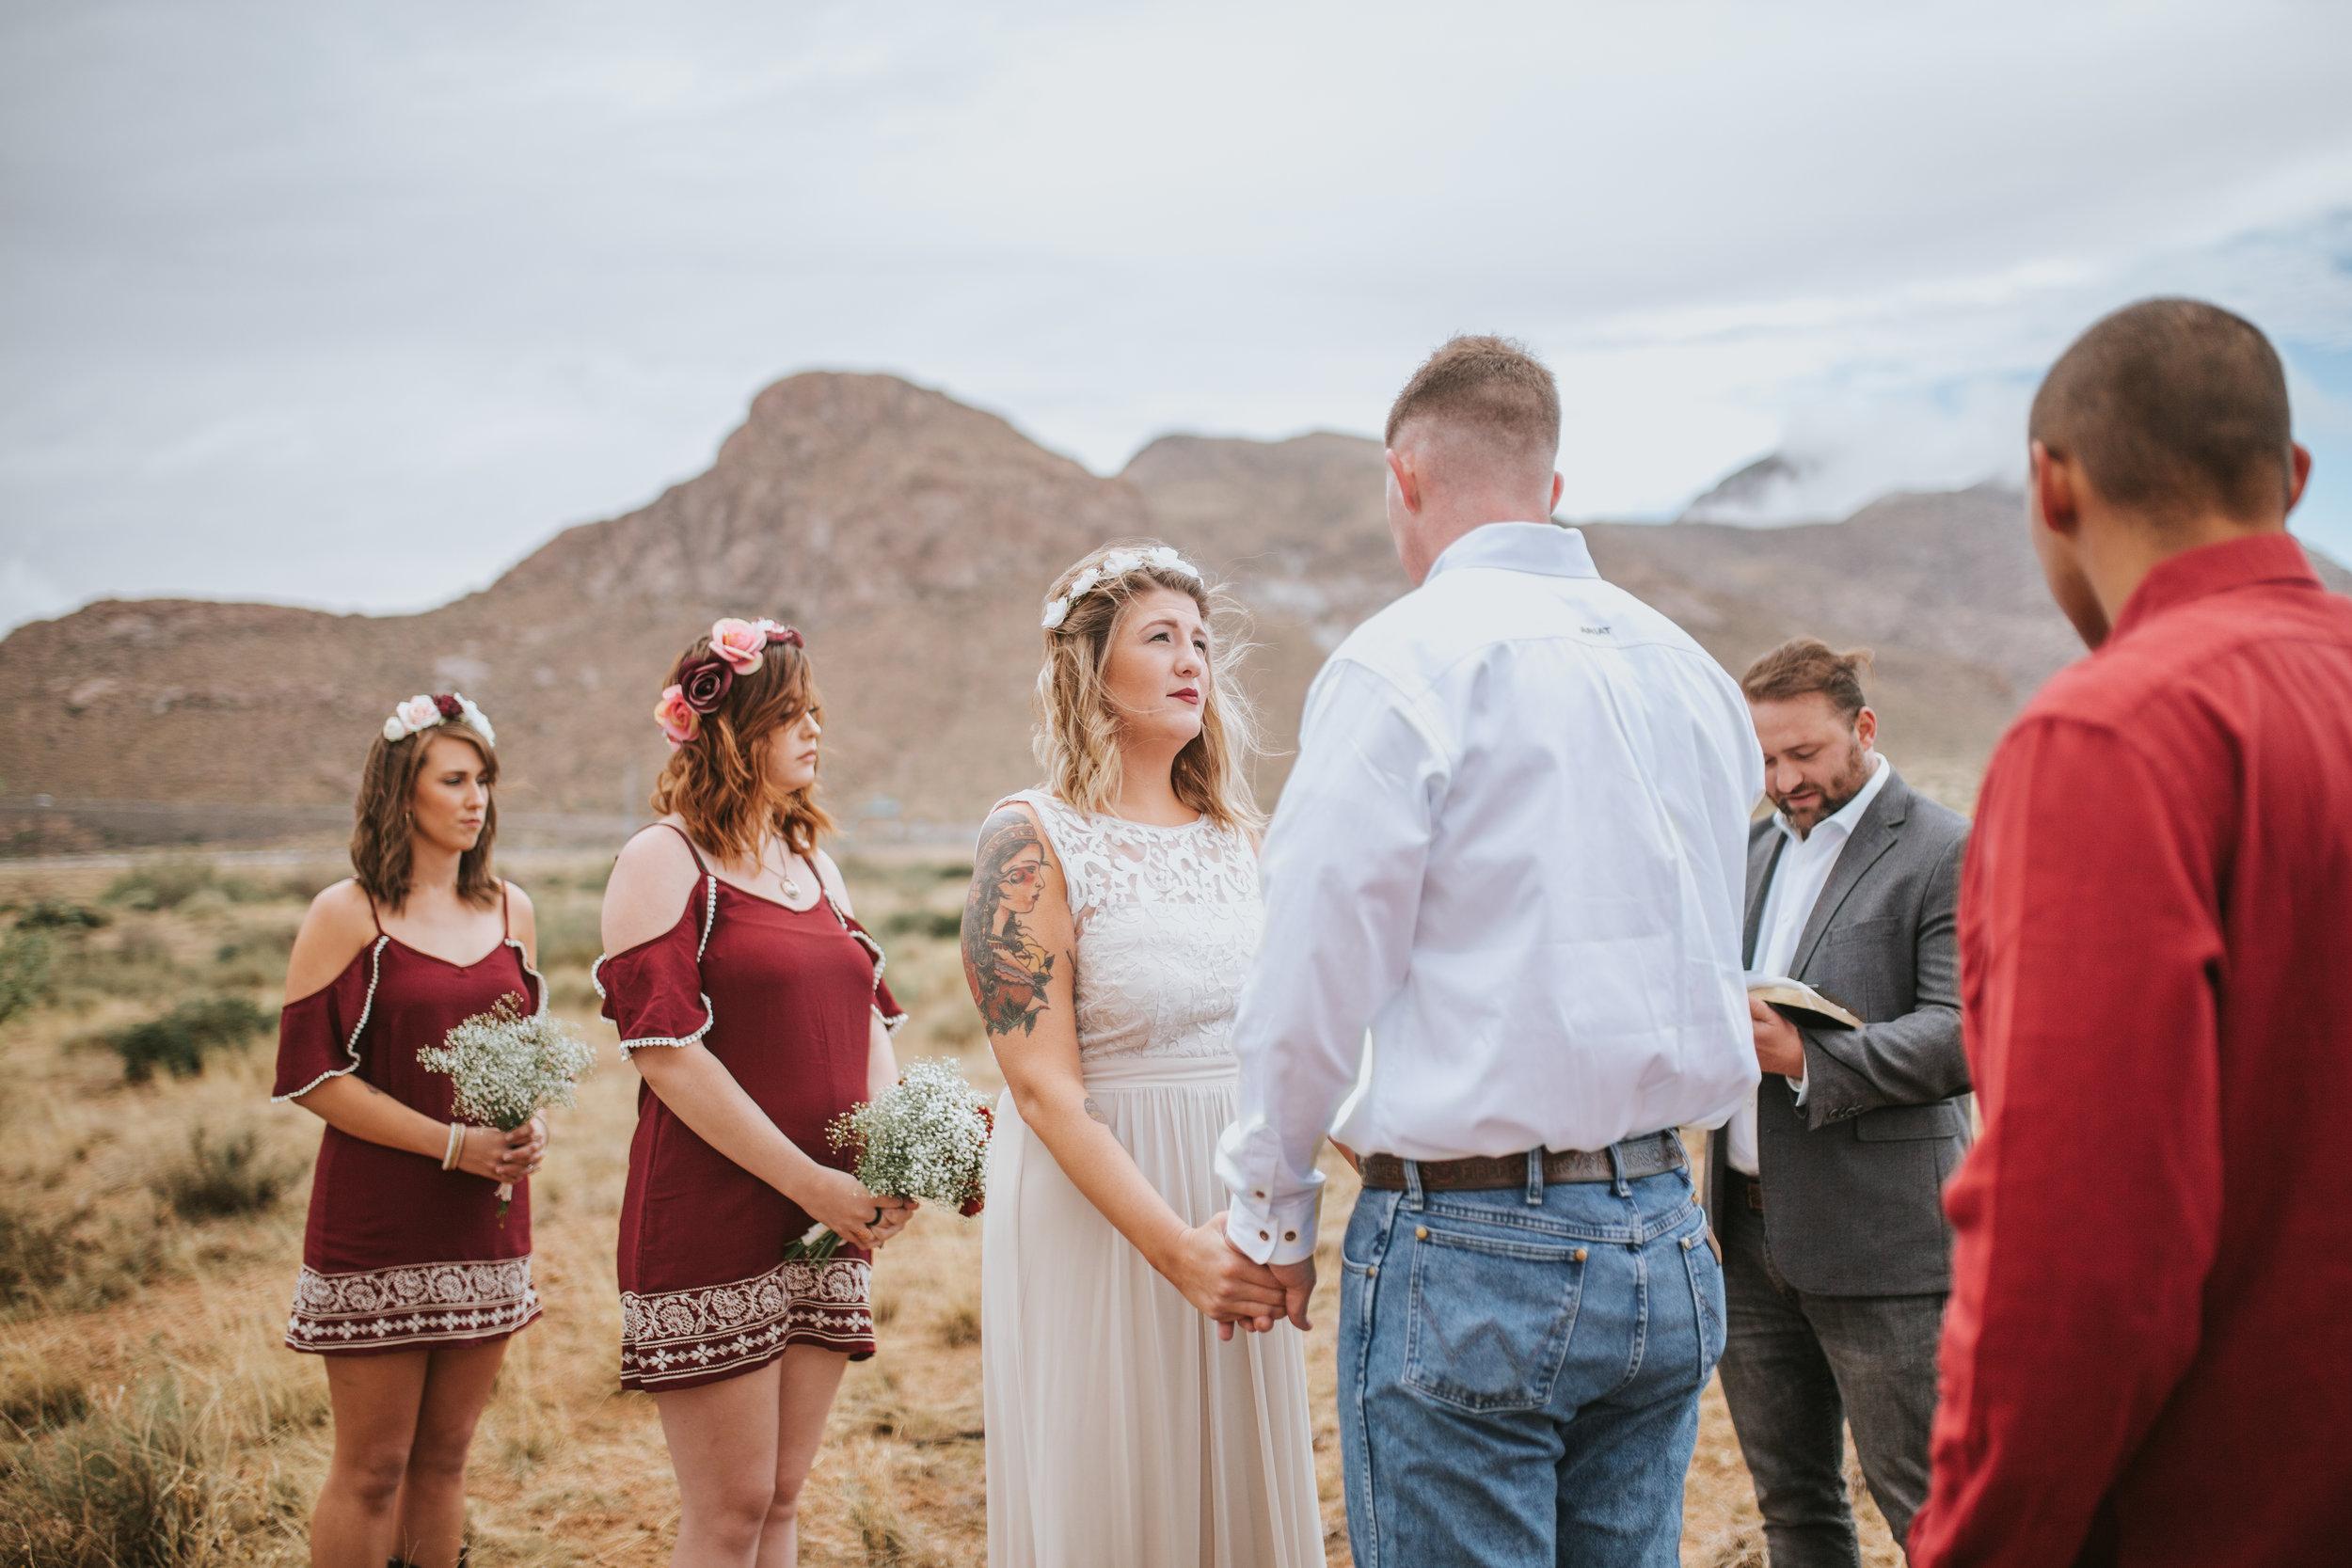 el-paso-texas-wedding-photographer-13